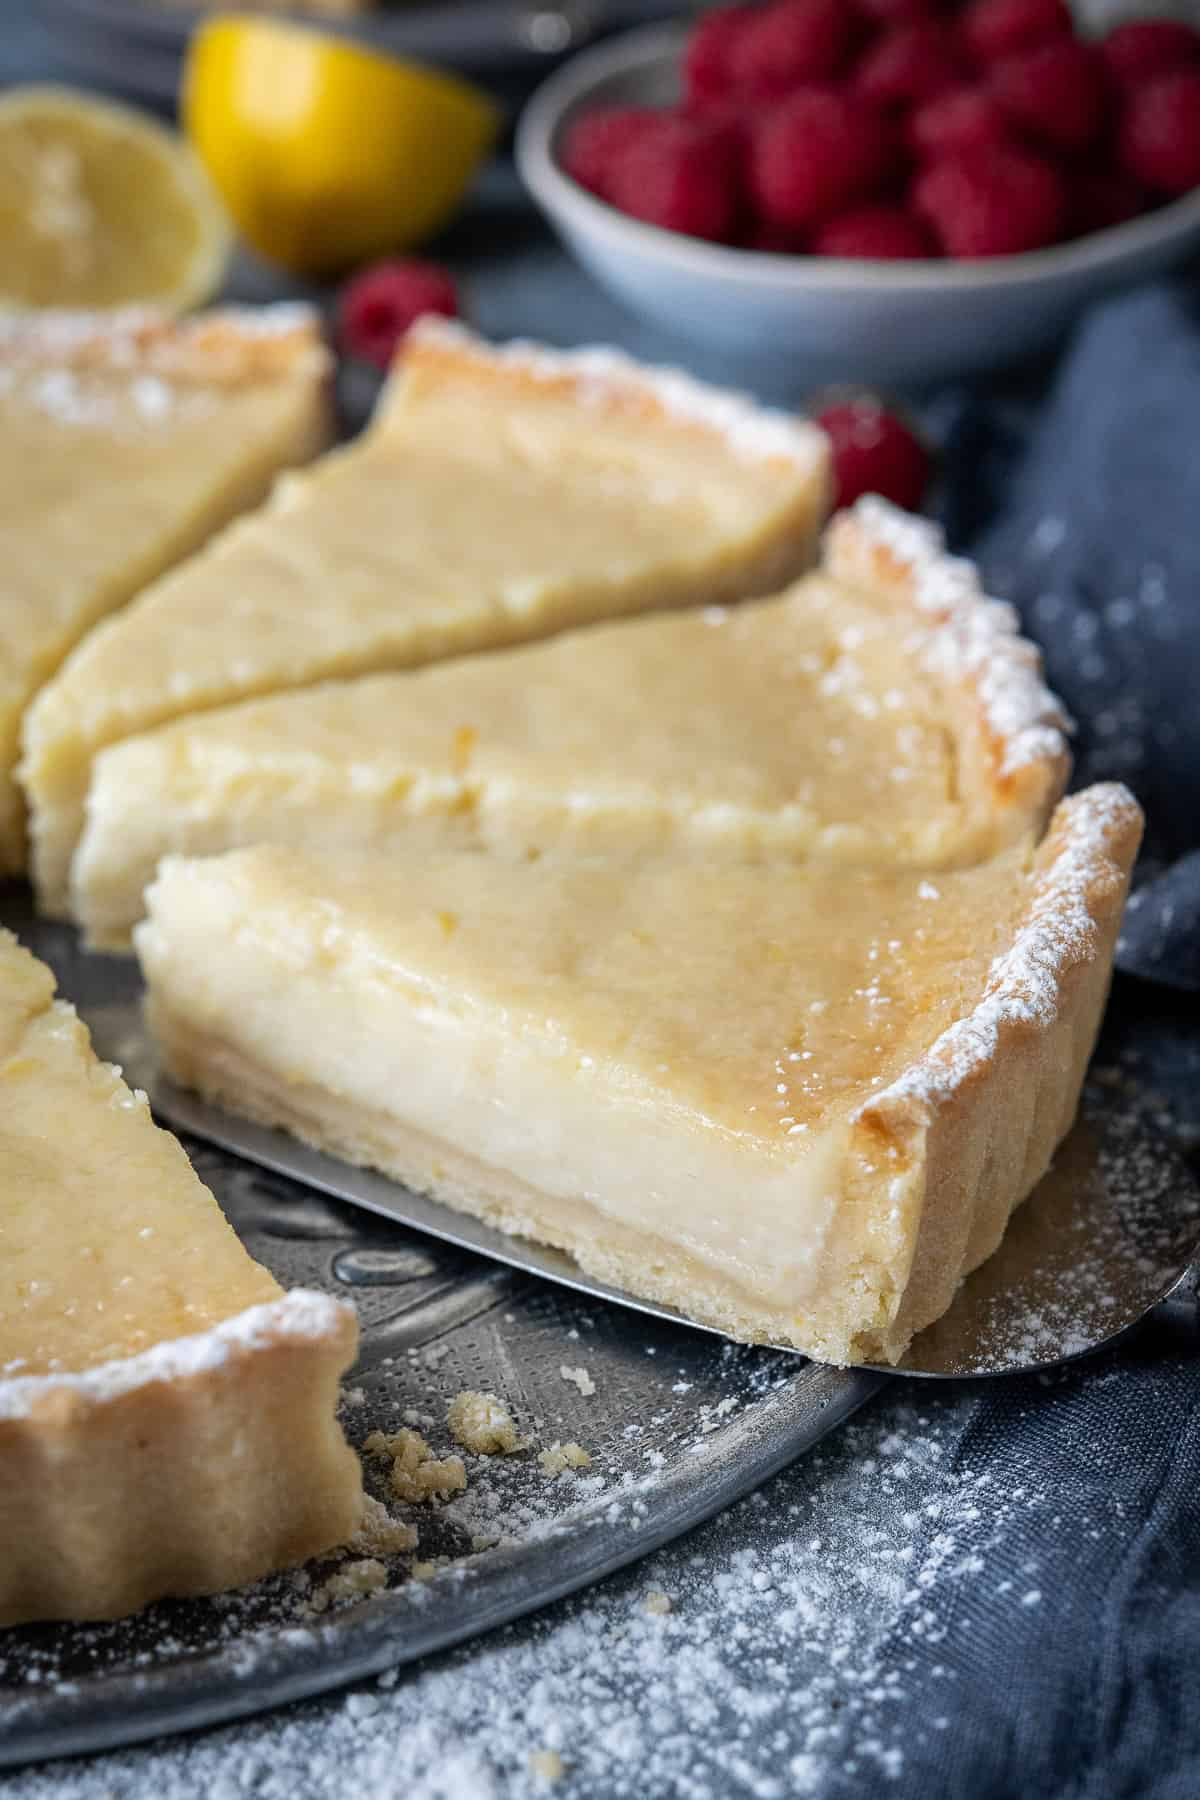 Close up of a slice of vegan lemon tart